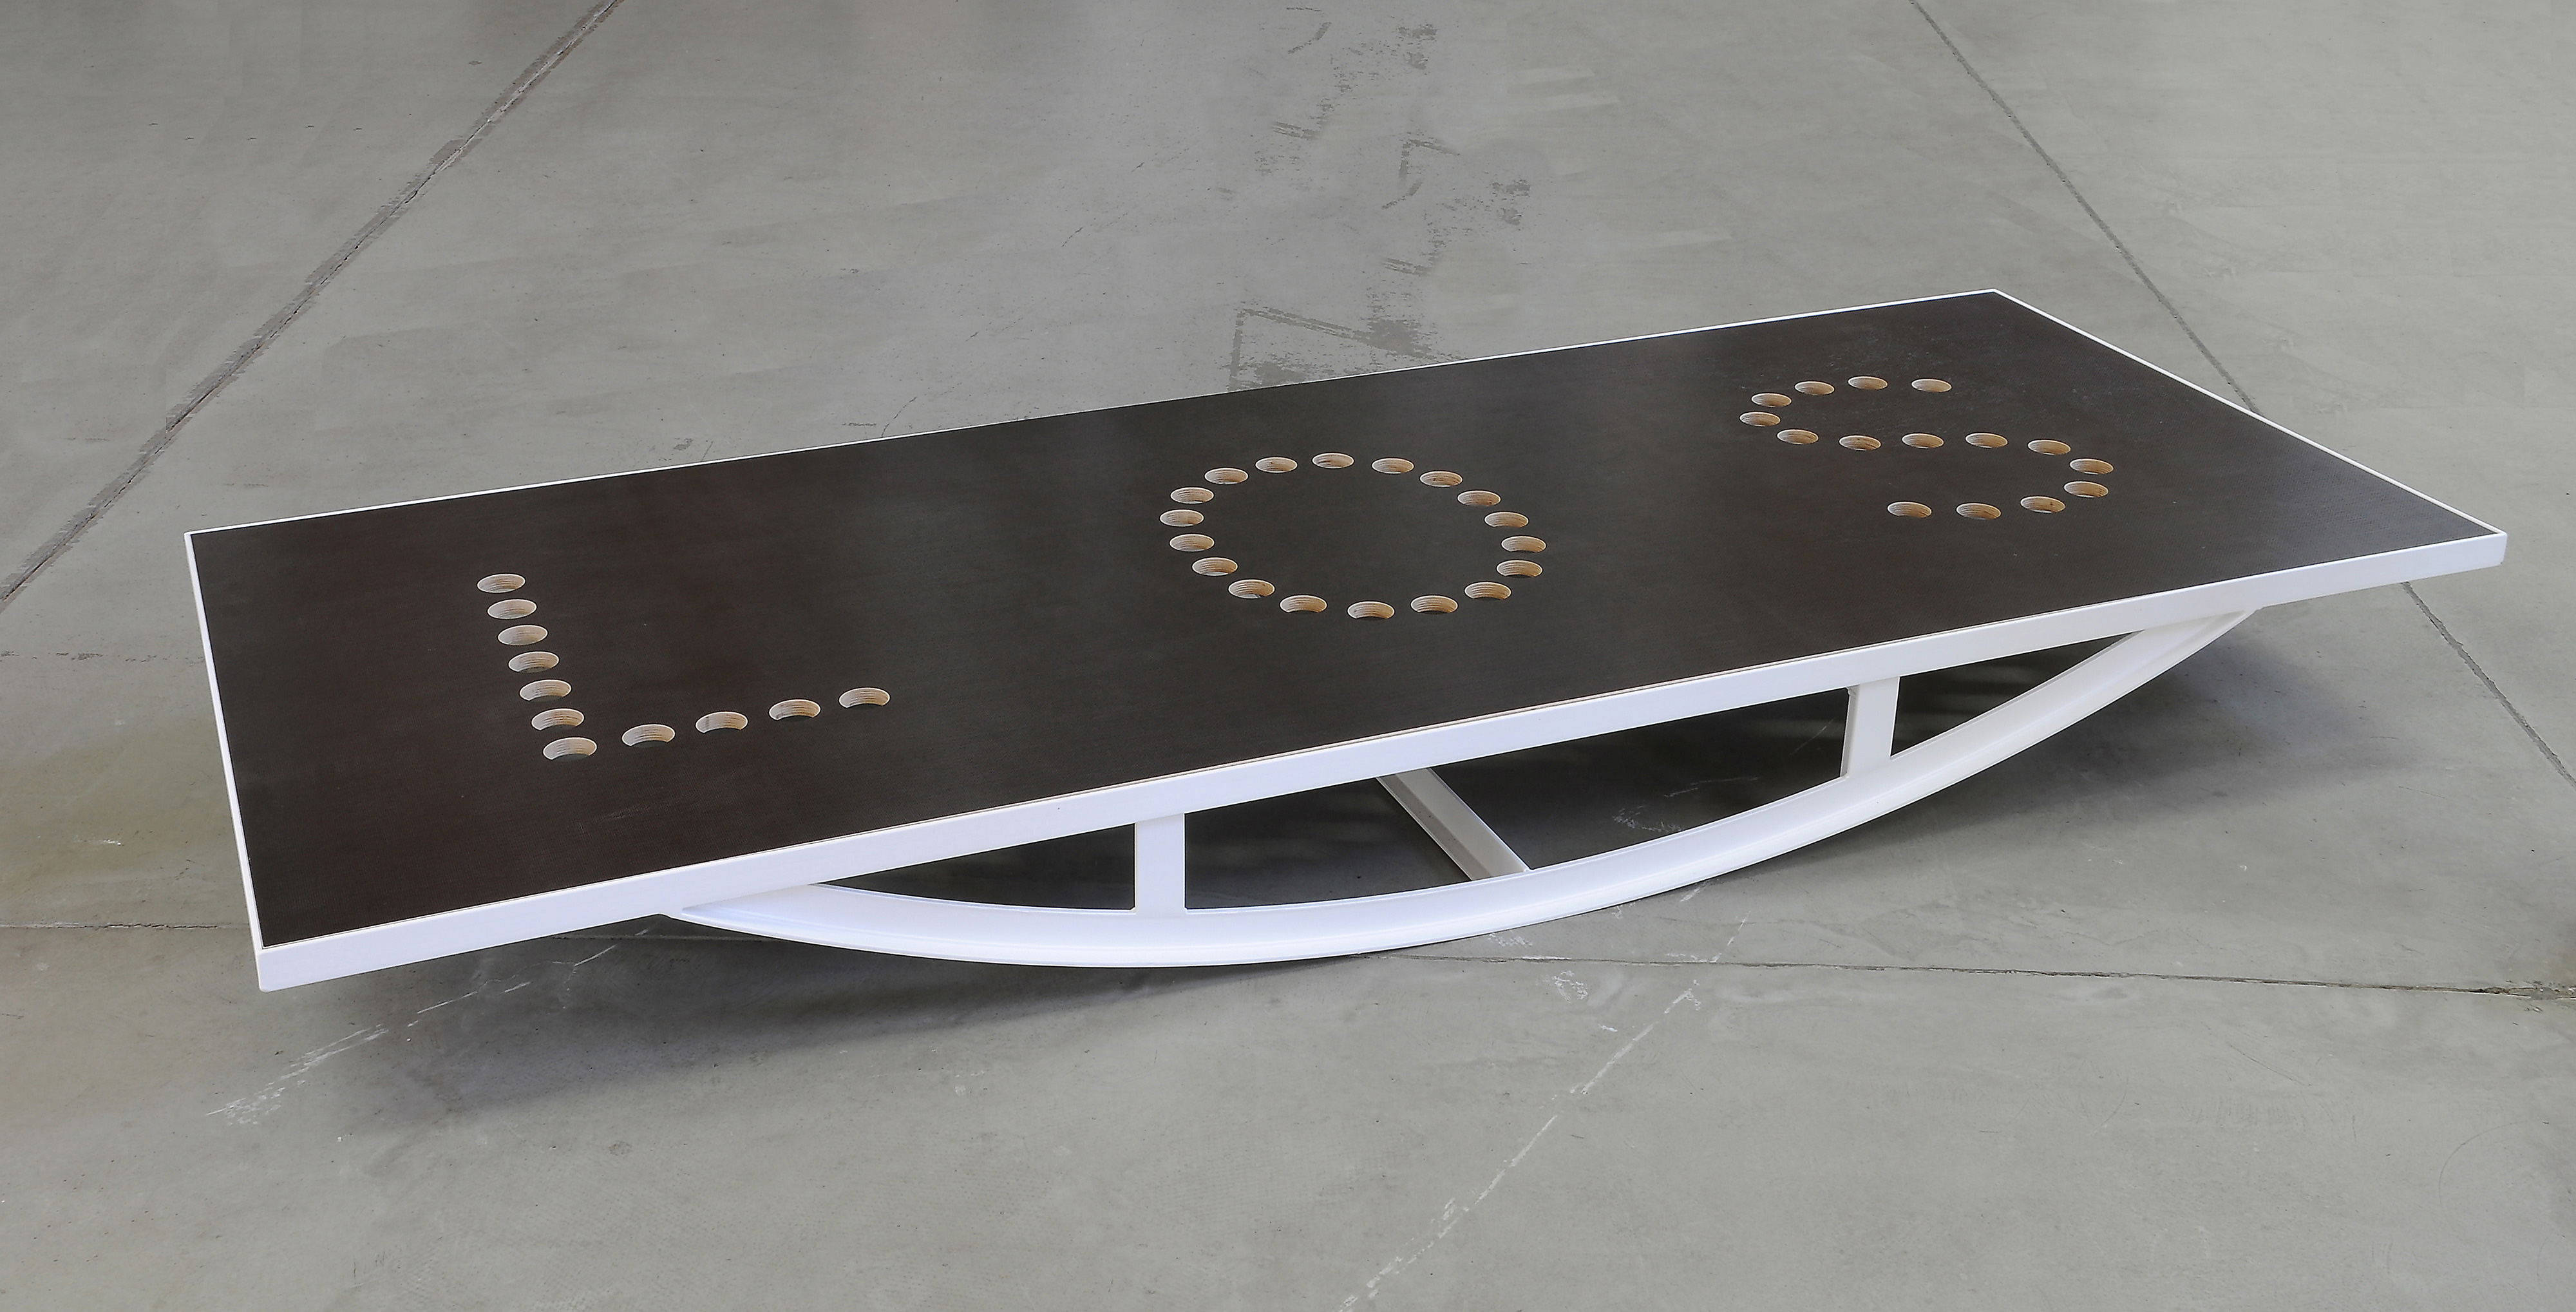 Galerie Barbara Thumm \ New Viewings #10 \ Susanne Lorenz